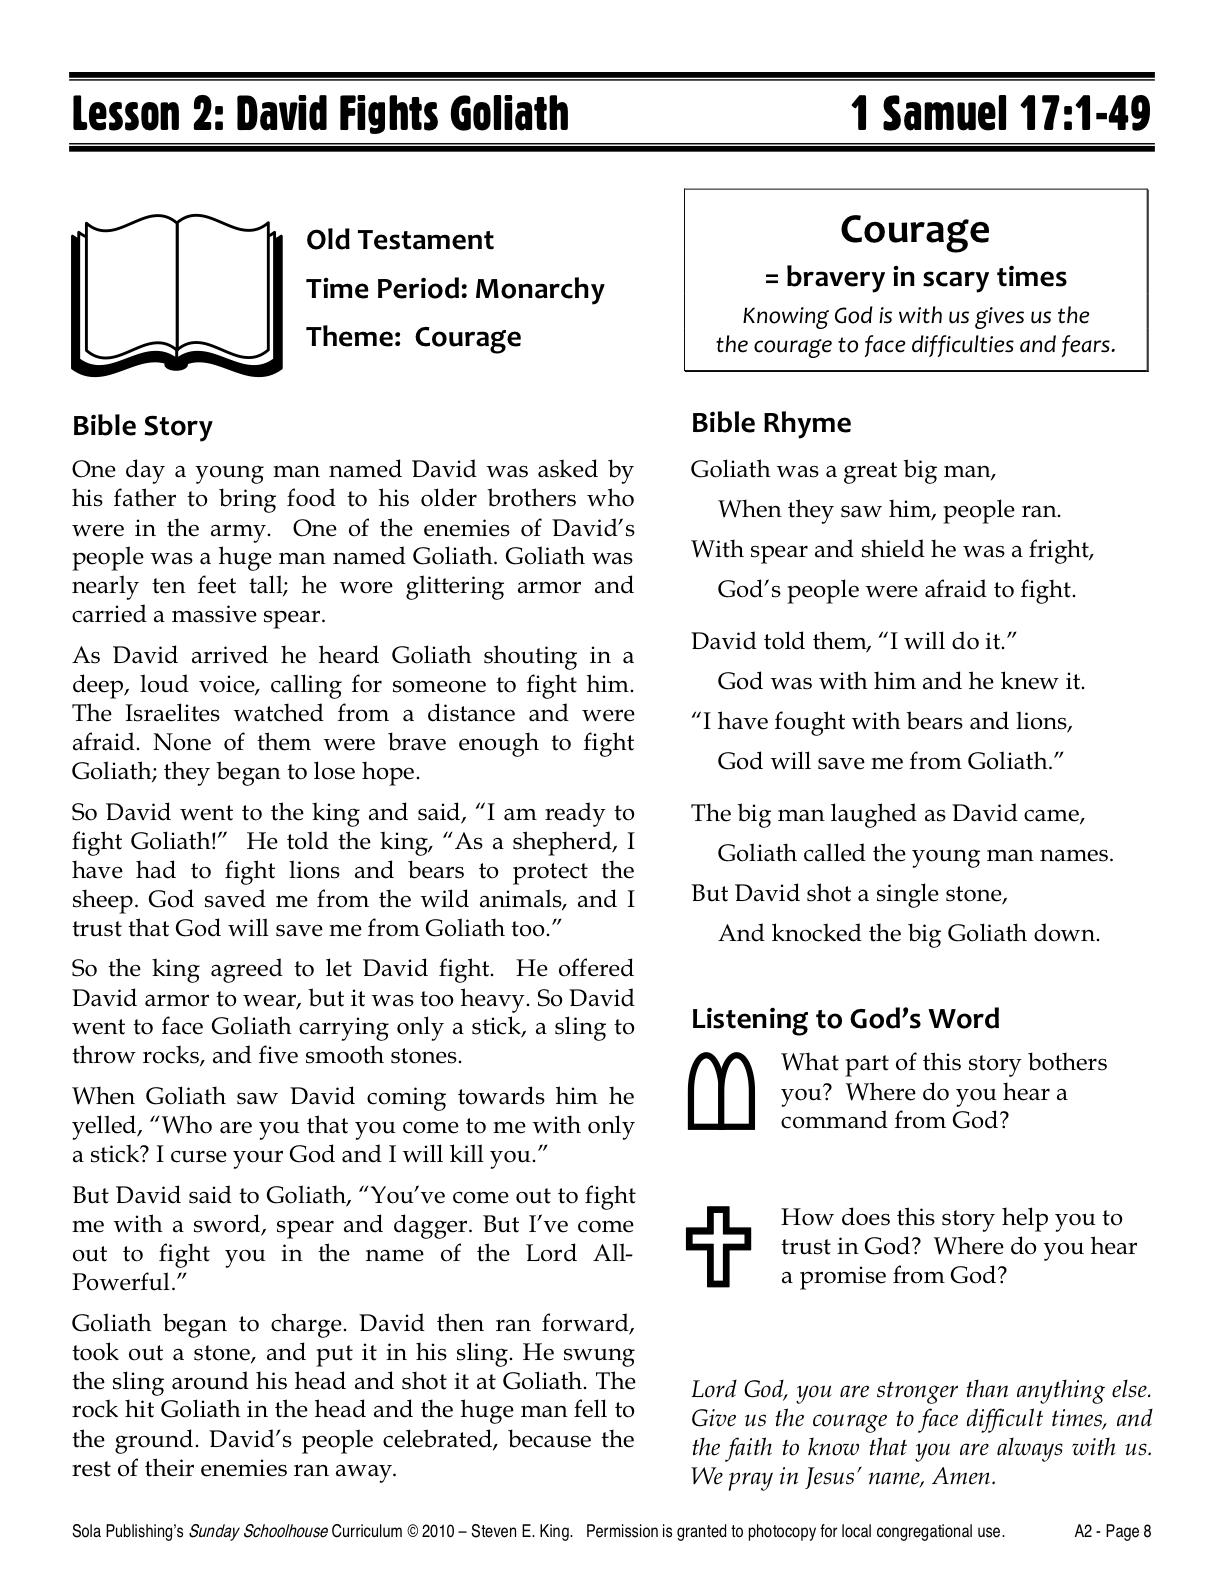 Sola Sunday School Archive November